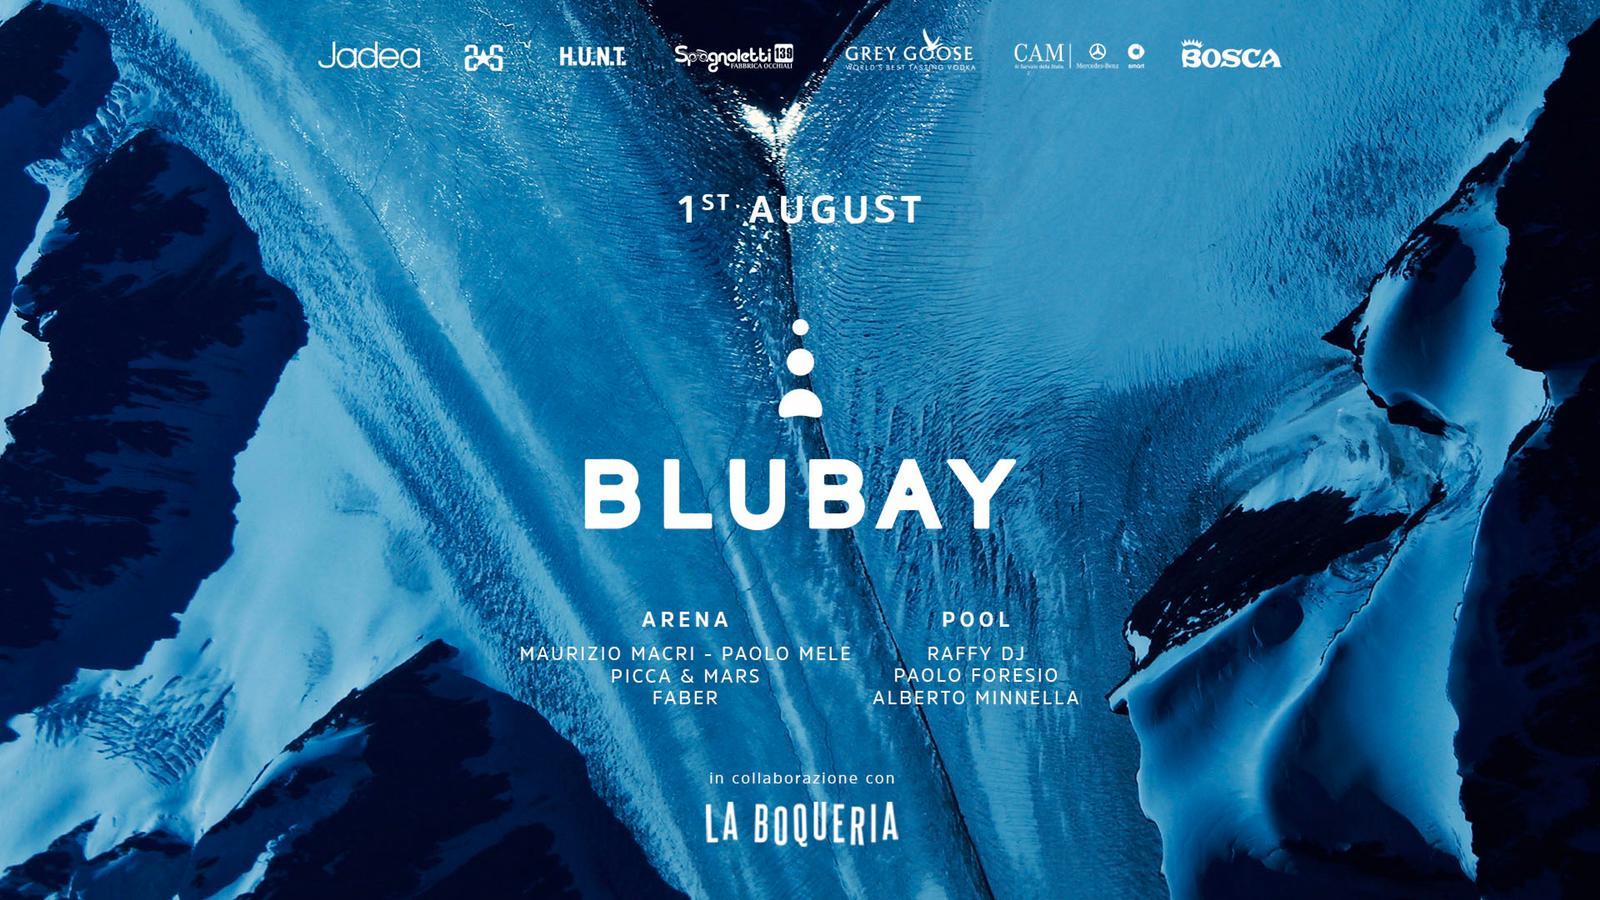 Sabato 1 Agosto - BLUBAY